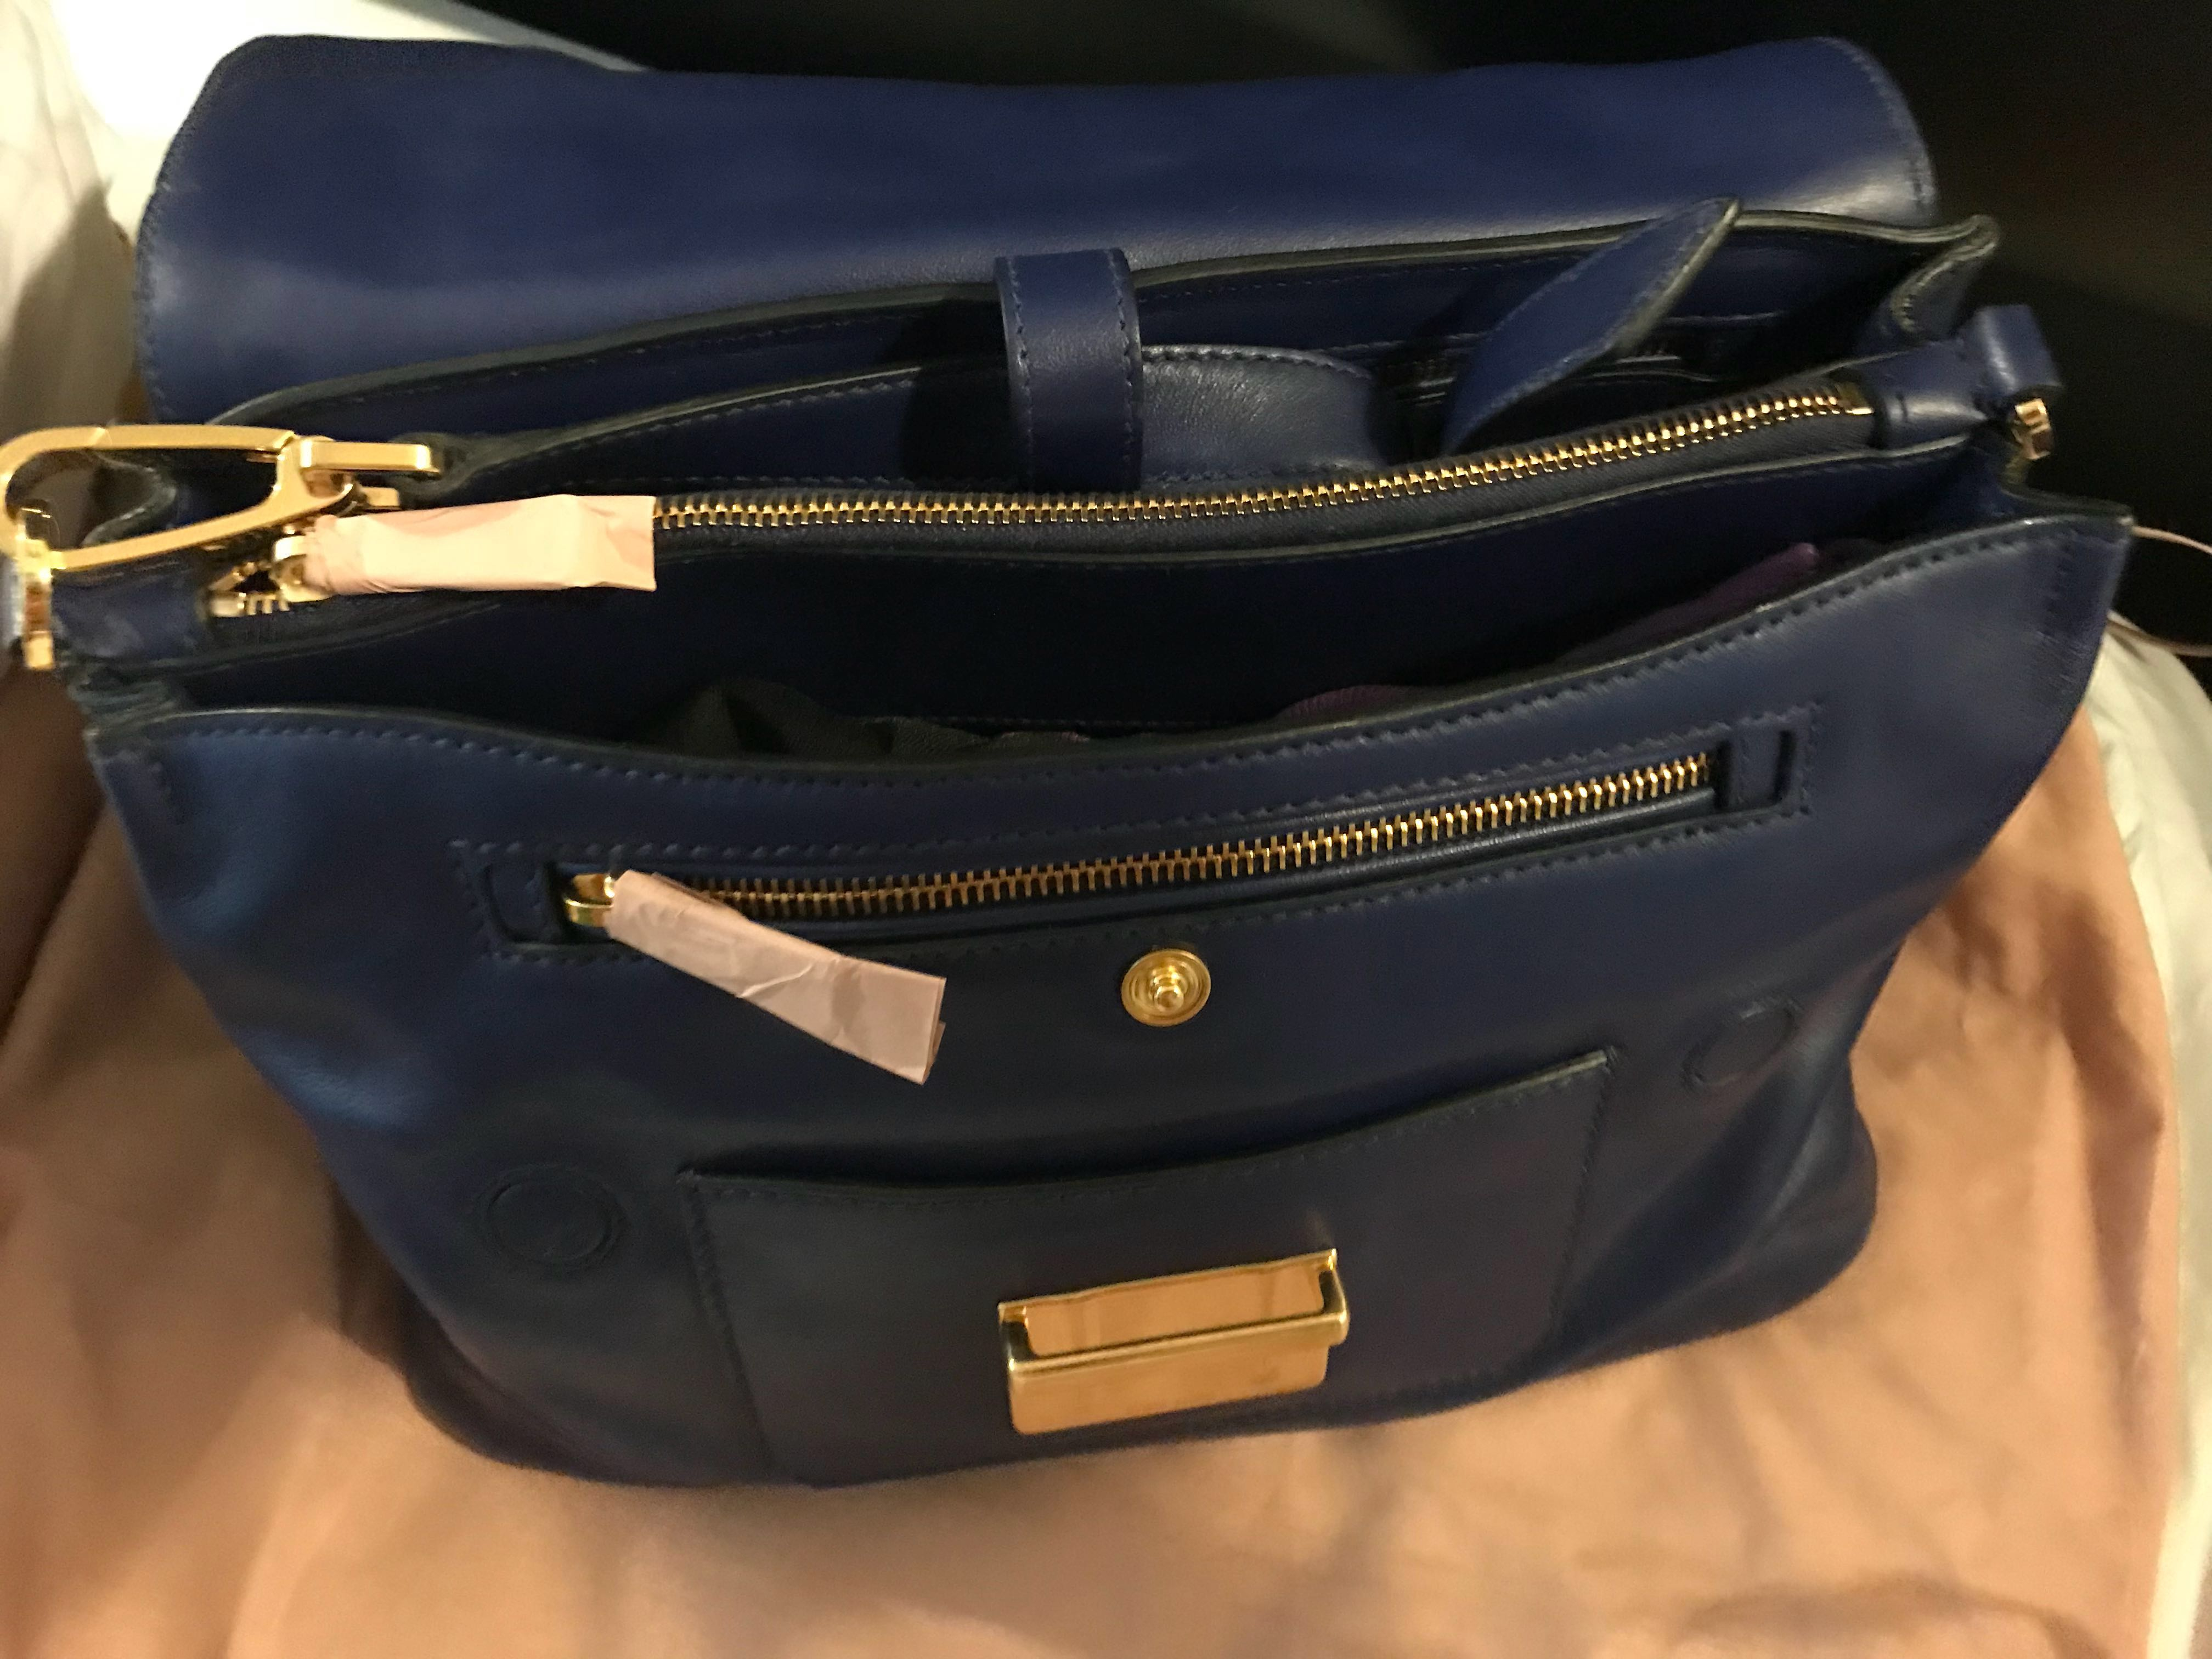 21e2097d0 Miu Miu Vitello soft leather satchel handbag, Women's Fashion, Bags ...